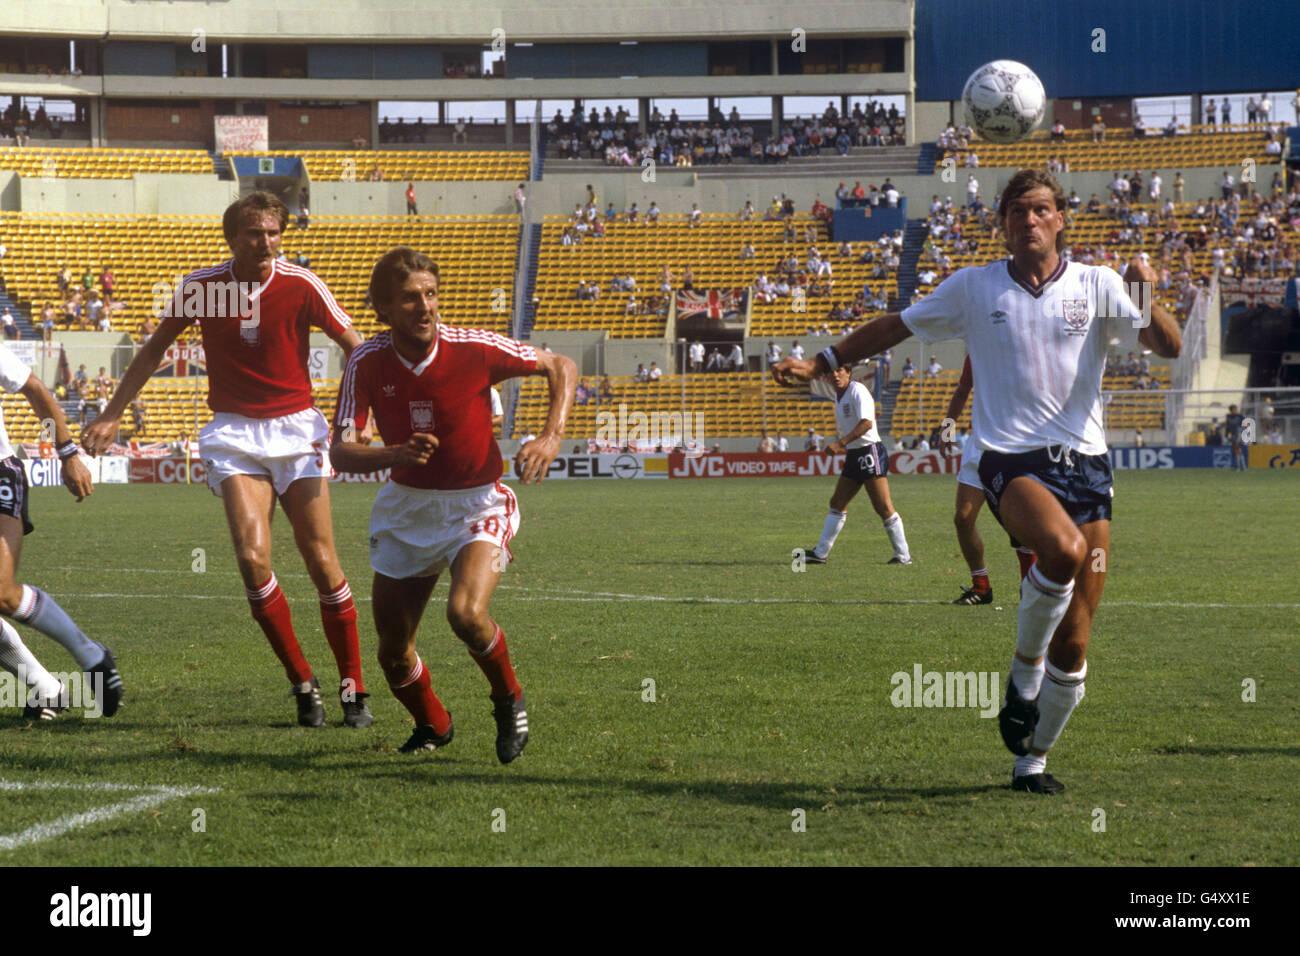 Archivelivefebruary2012 photos archivelivefebruary2012 images alamy - Coupe du monde mexique 1986 ...